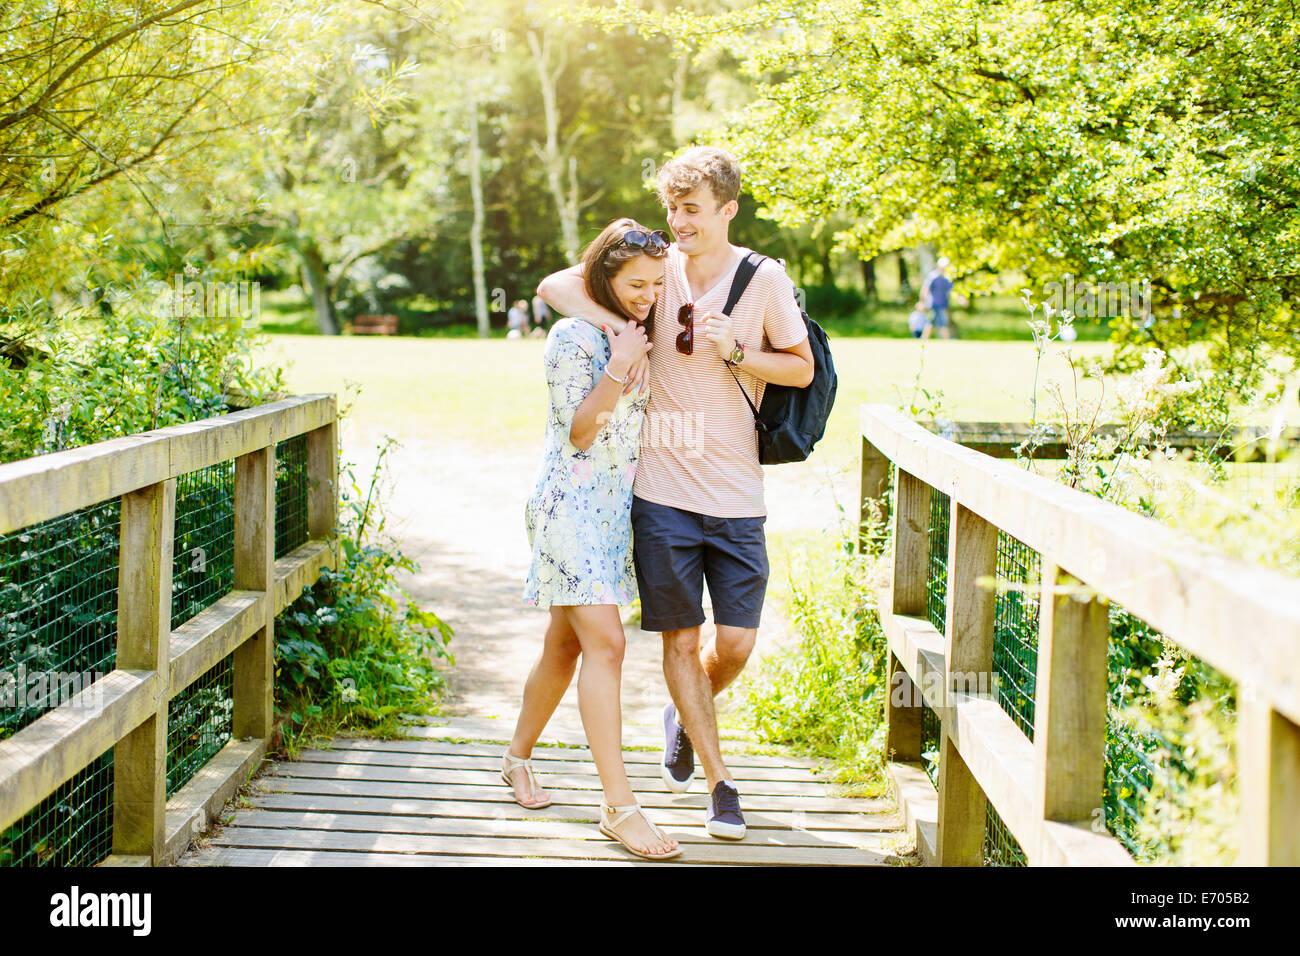 Couple walking over wooden bridge in the park - Stock Image